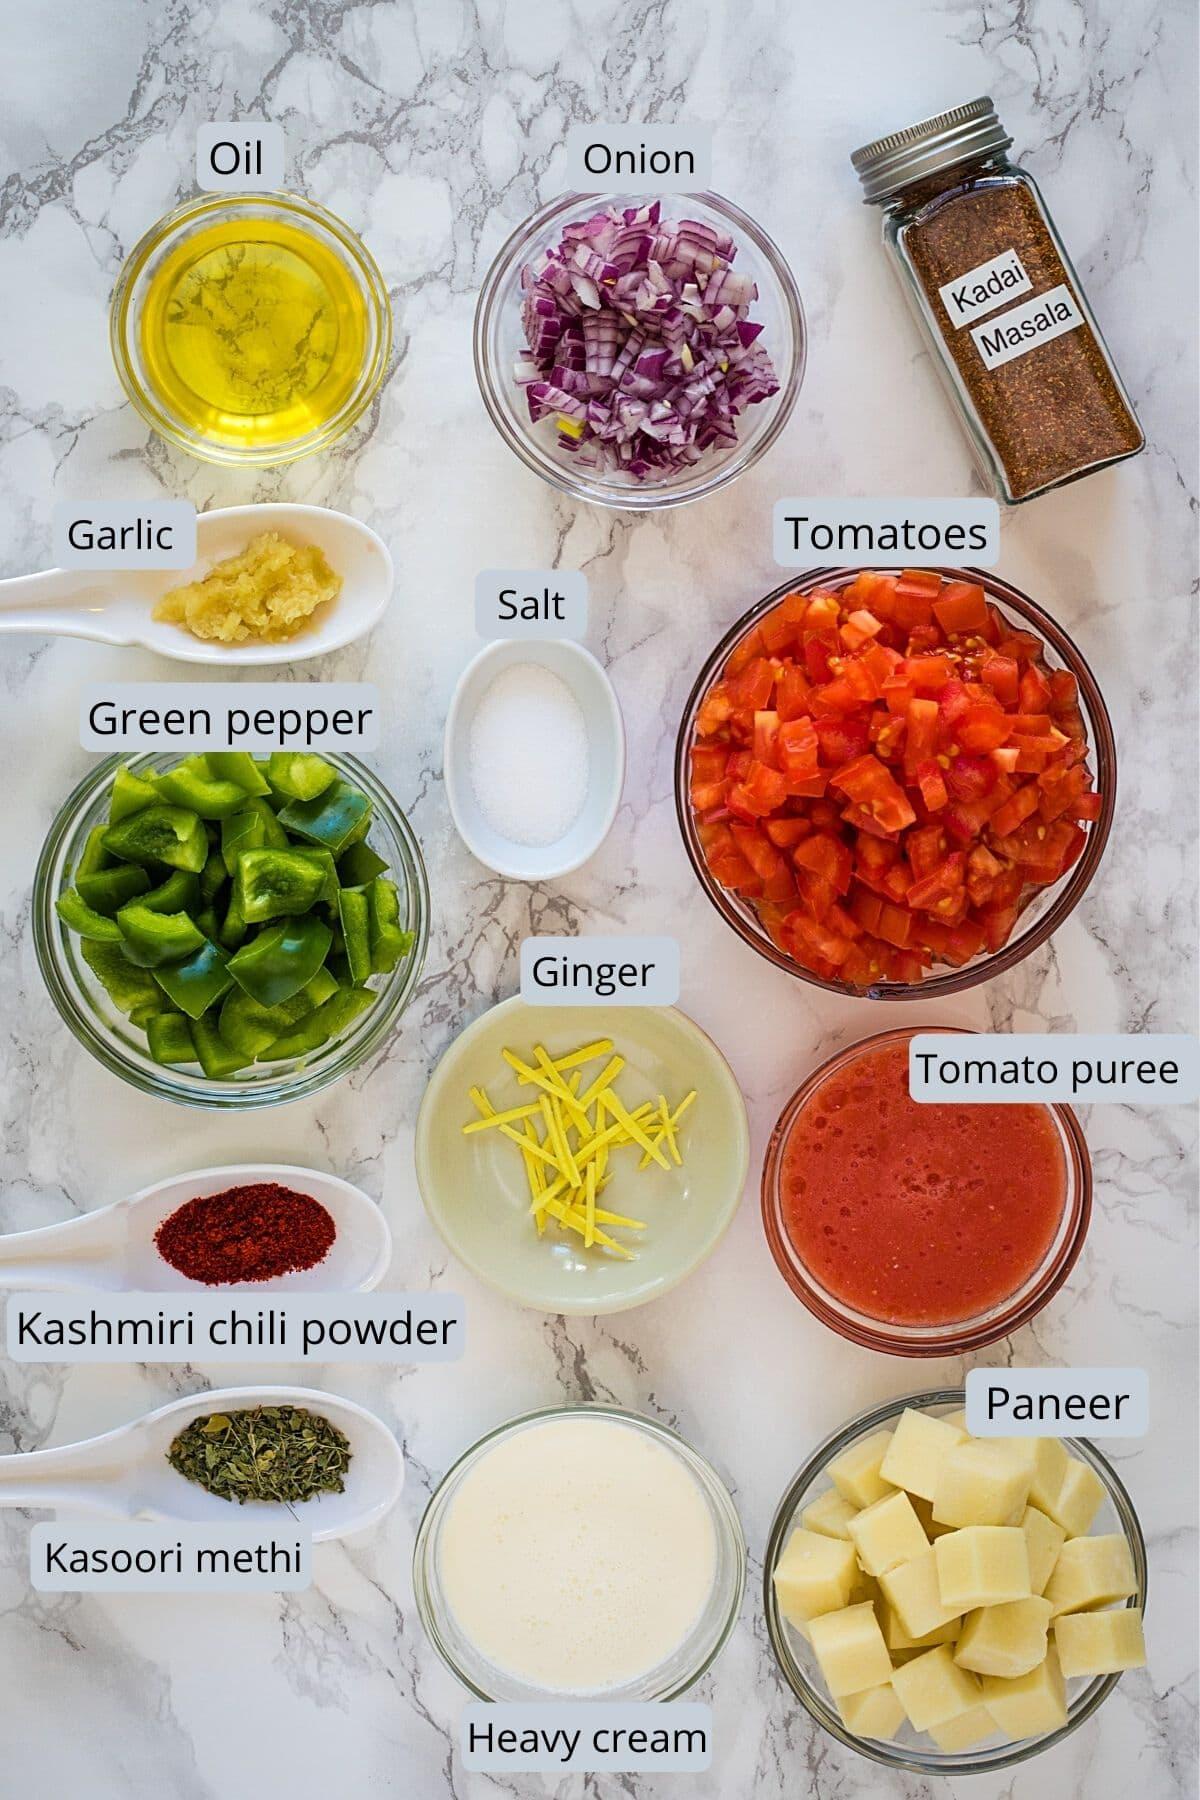 Ingredients used in kadai paneer includes masala, oil, onion, tomato, peppers, ginger, garlic, paneer, cream, salt.